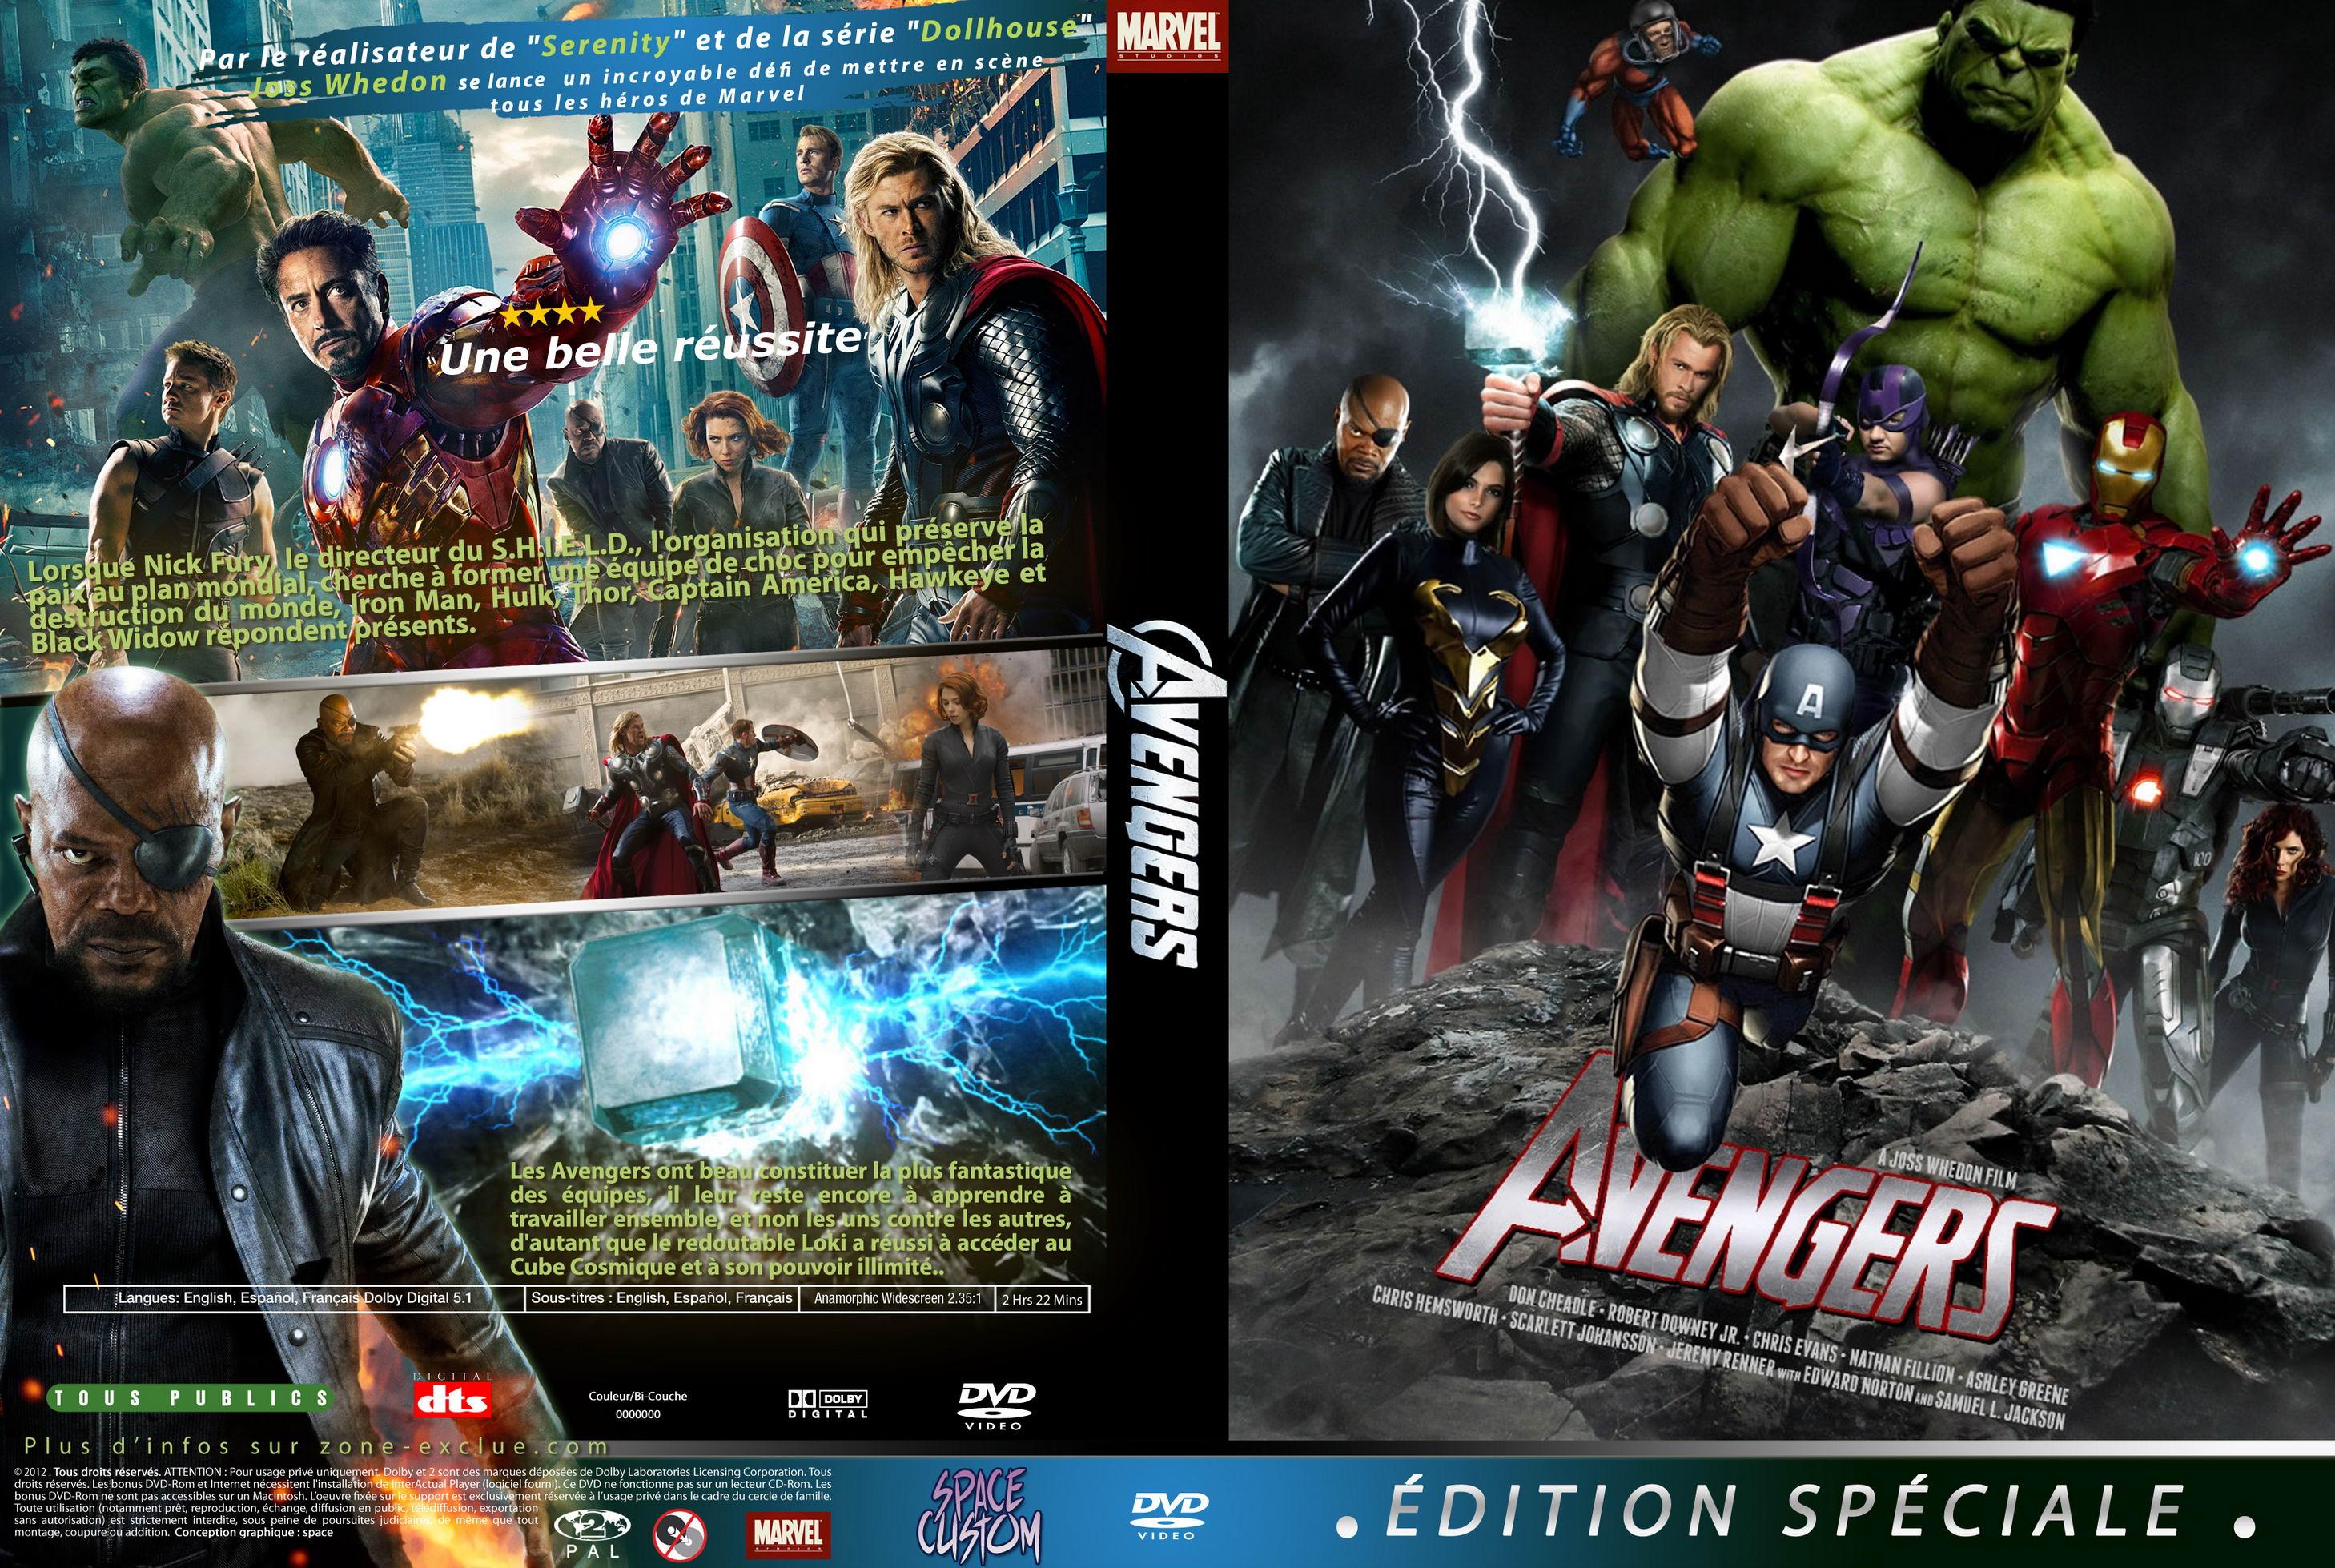 Avengers movie review imdb - Tokko episode 2 english dub